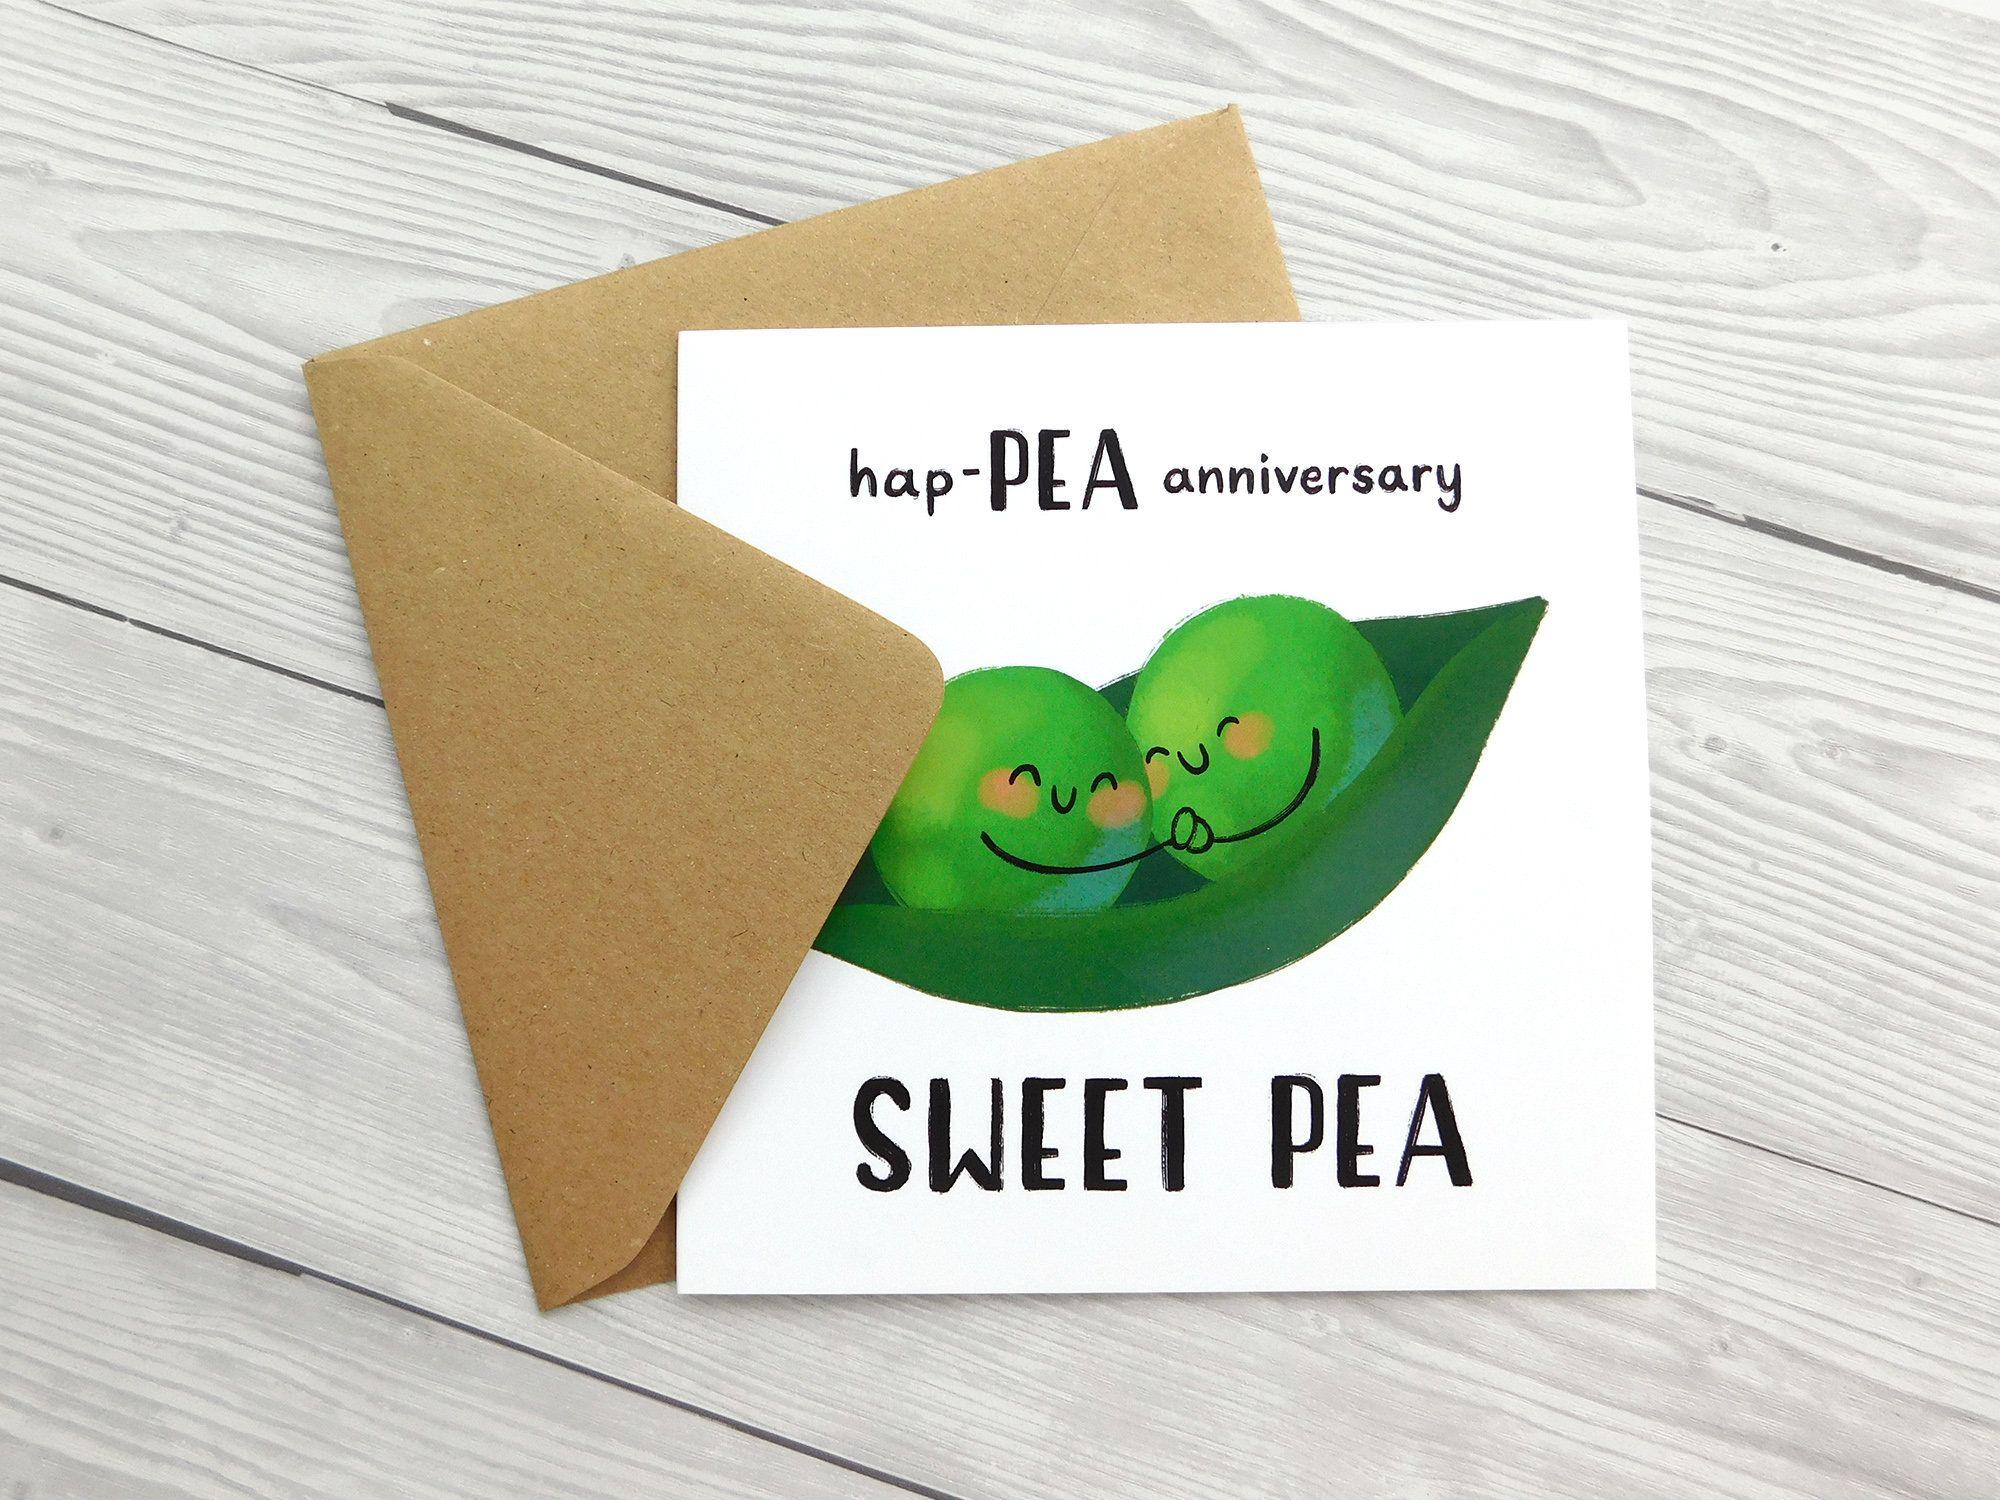 Sweet Pea Anniversary Card Cute Vegetable Pun Card Hap Pea Etsy Pun Card Anniversary Cards Square Greeting Card